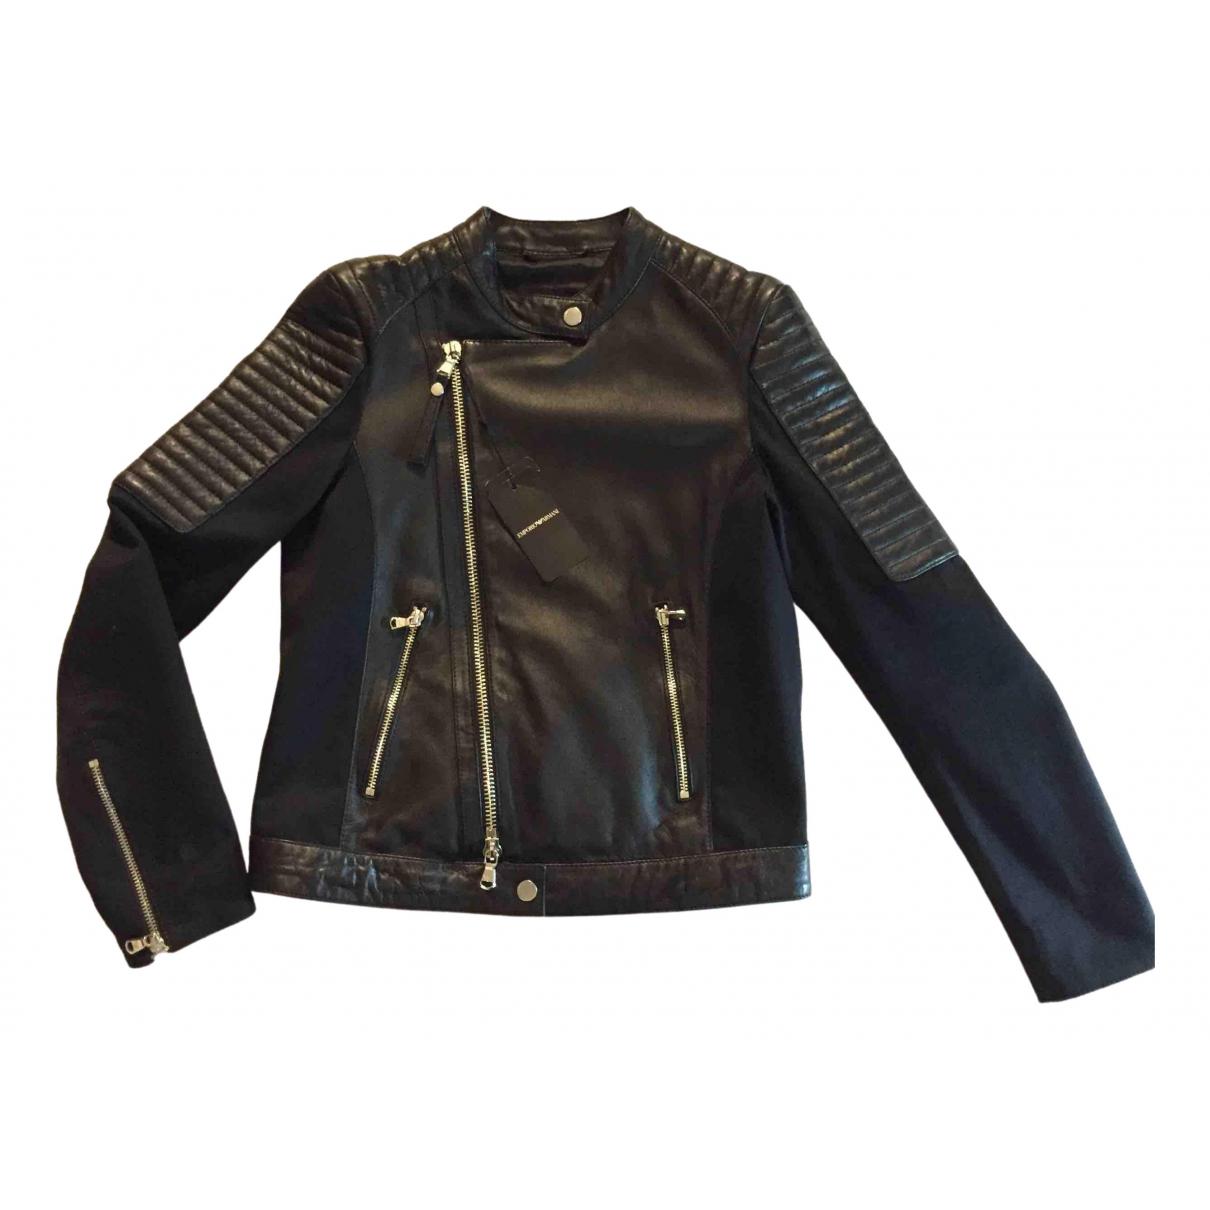 Emporio Armani \N Black Leather jacket for Women S International